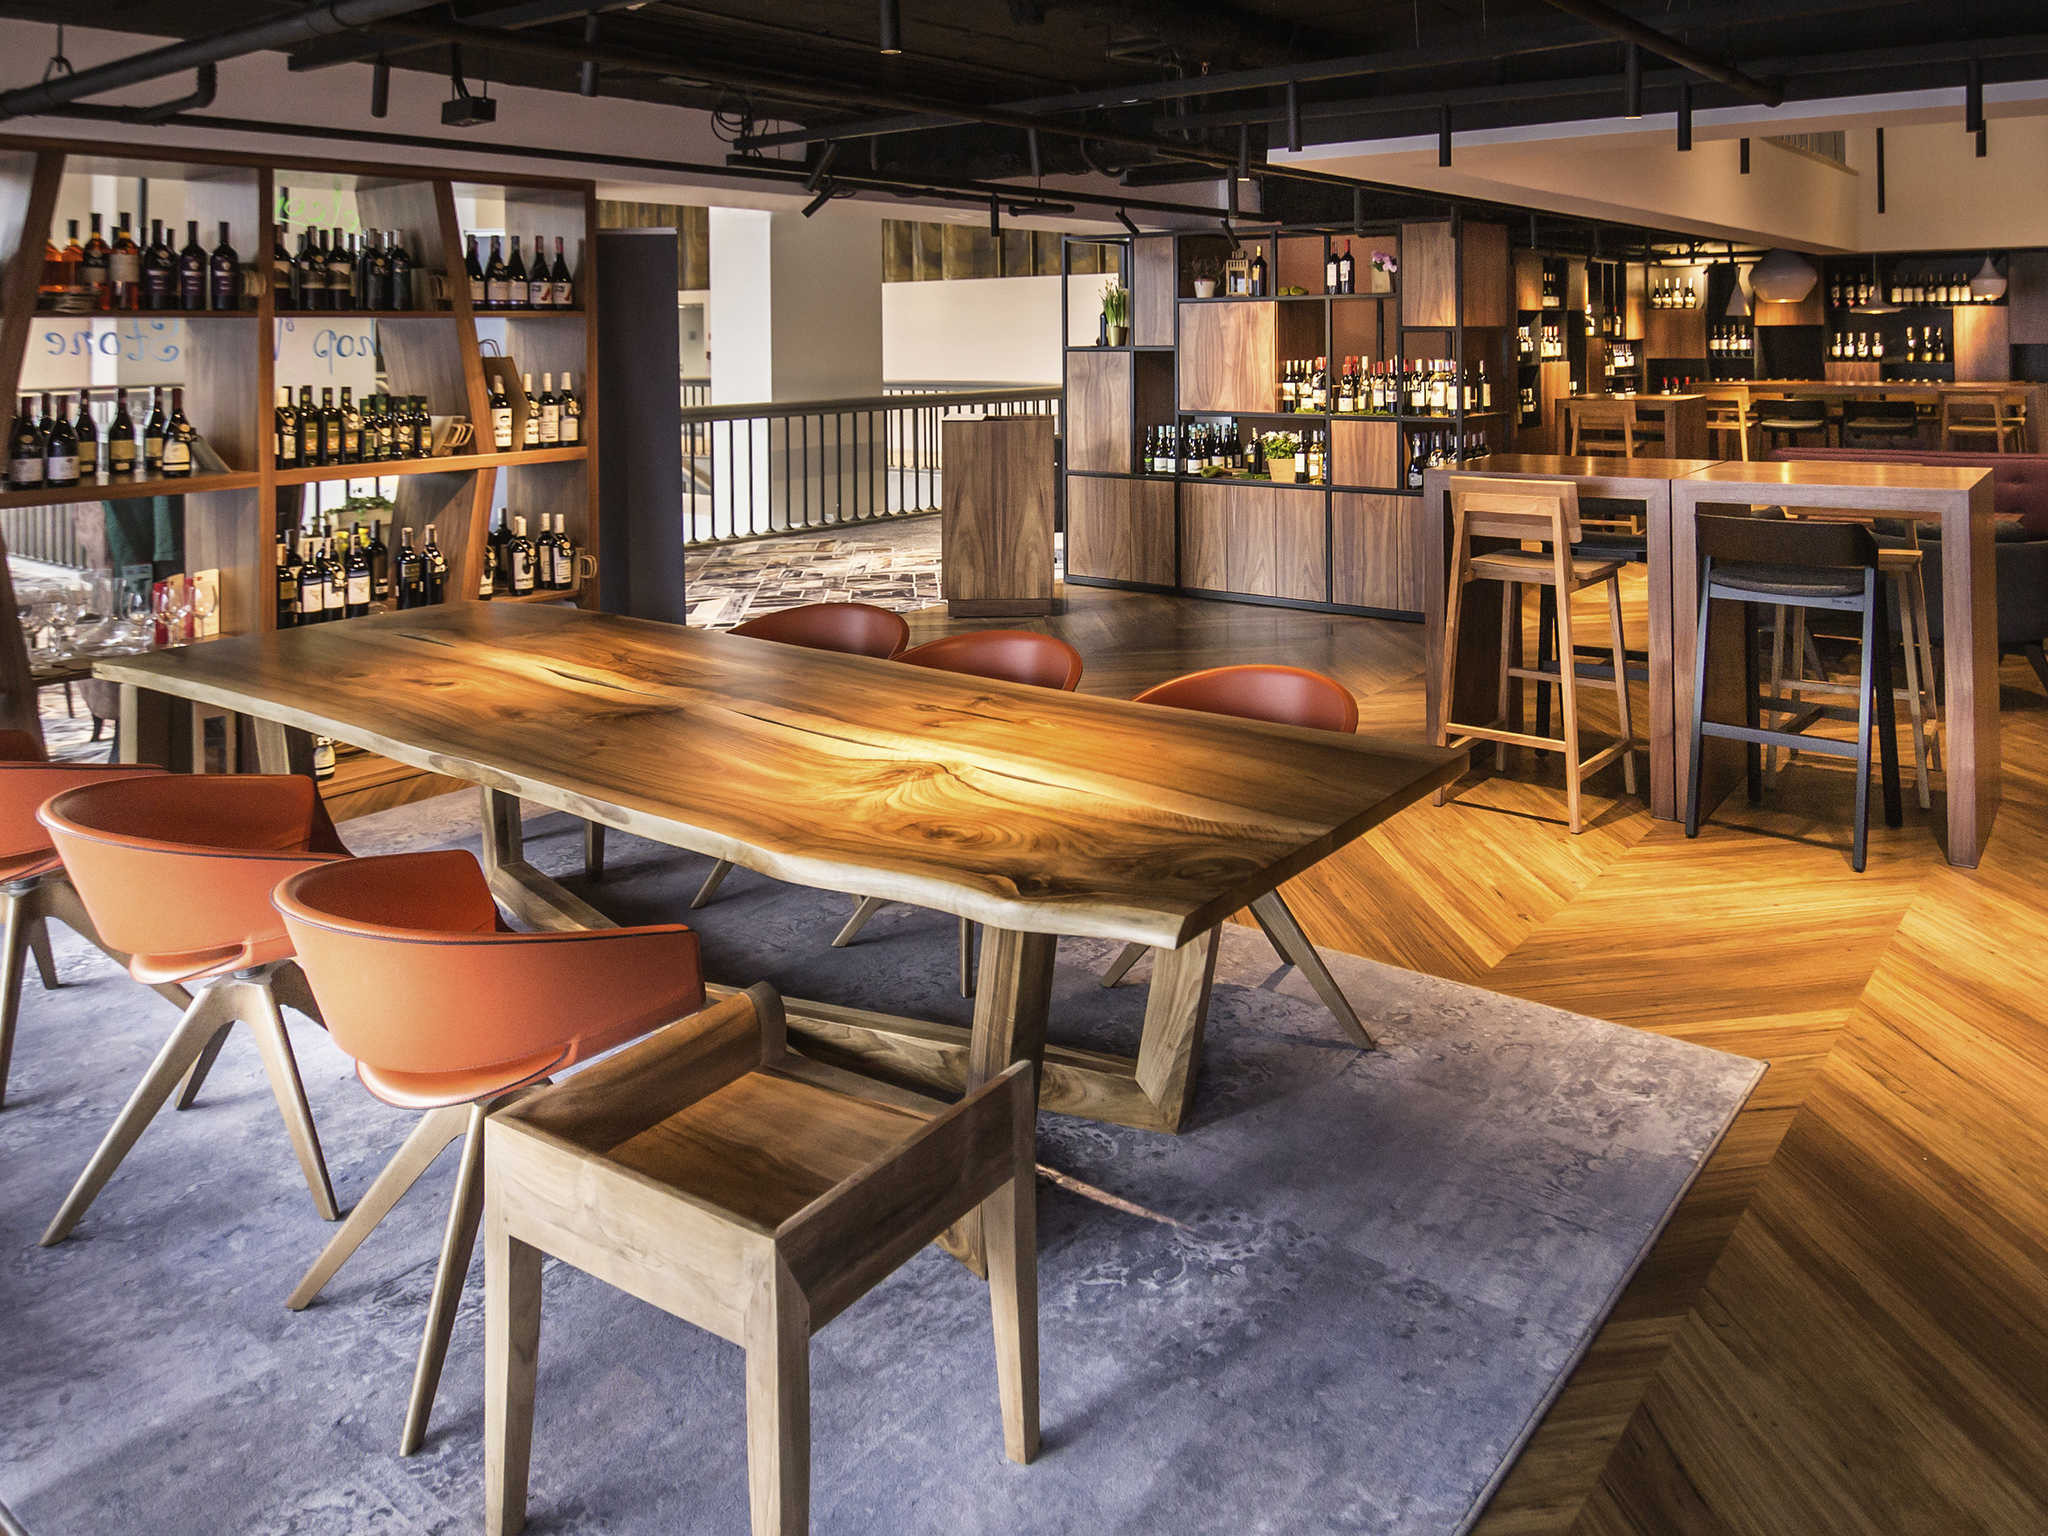 hardwood floor direction change of hotel novotel poznan centrum regarding restaurant novotel poznan centrum